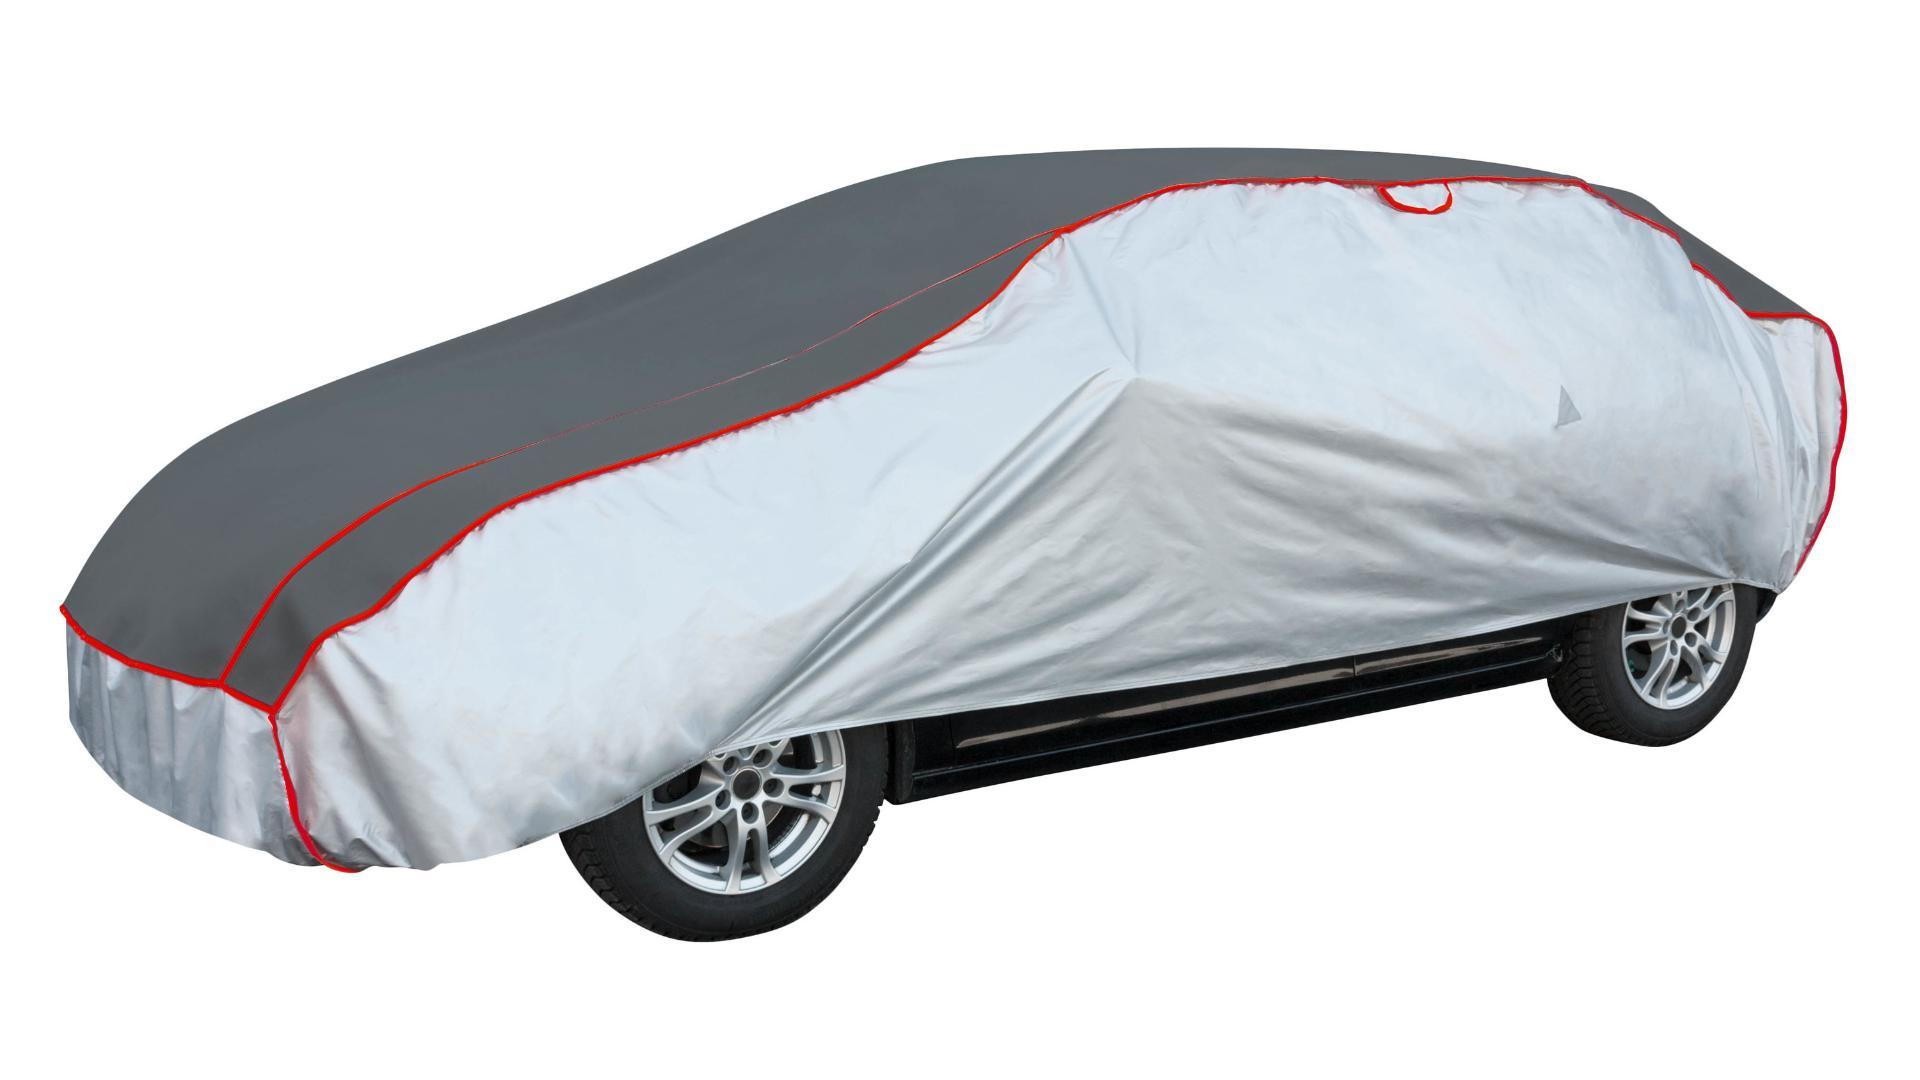 Walser plachta proti krúpam Premium Hybrid  XL 525x175x120cm